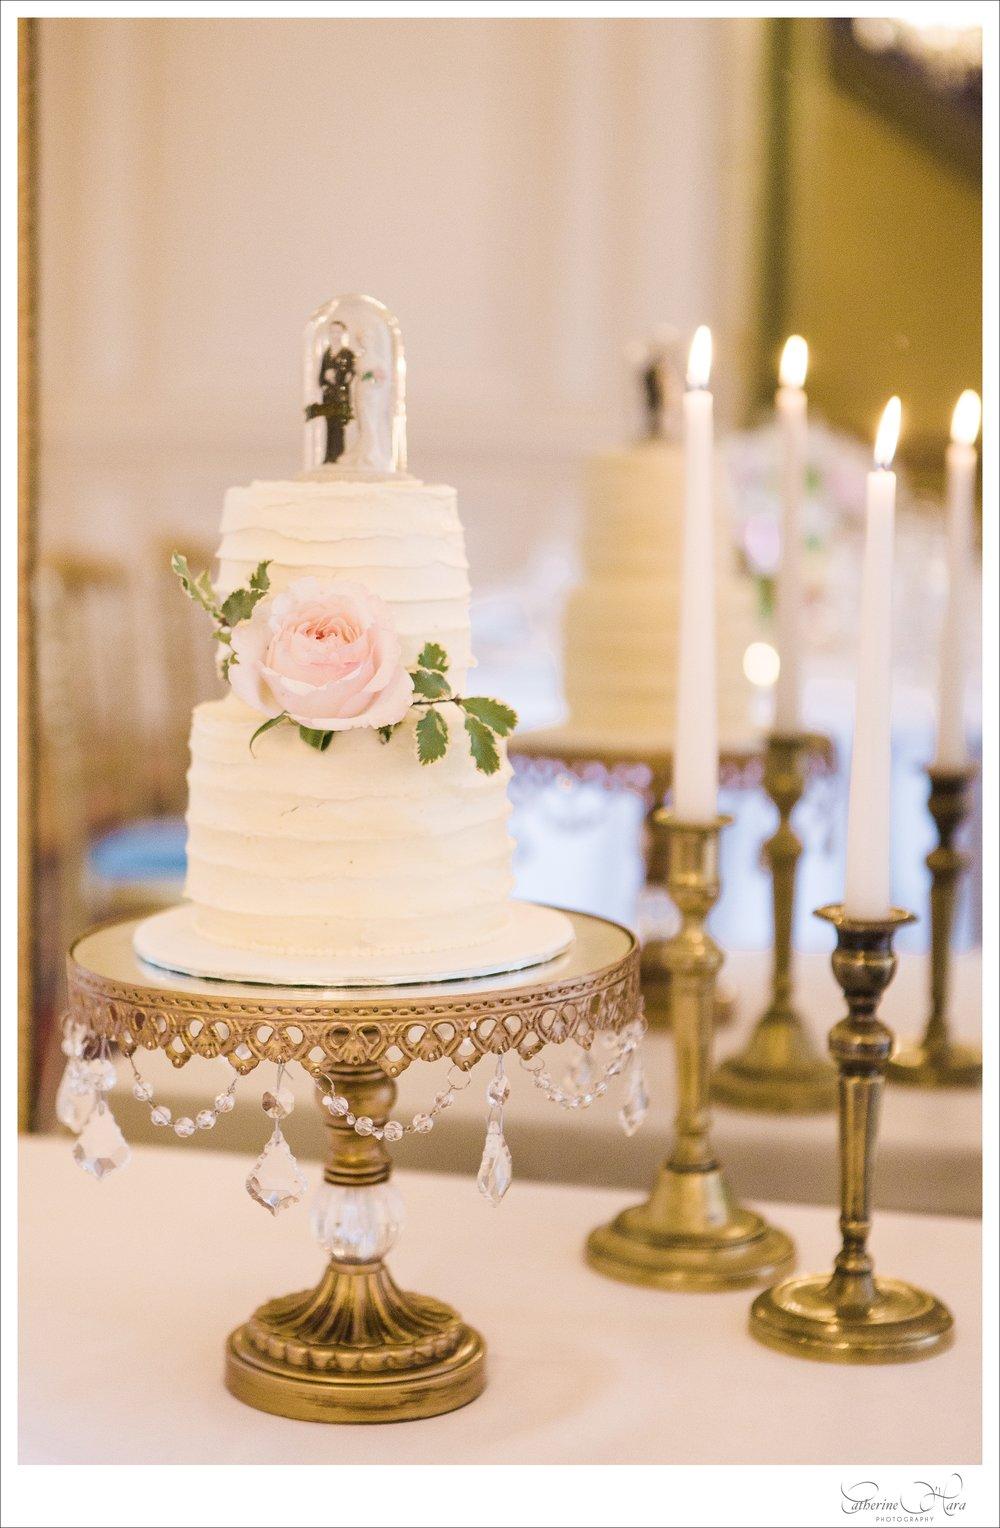 cake  Synies  • photo  Catherine O'Hara  • cake stand  Opulent Treasures